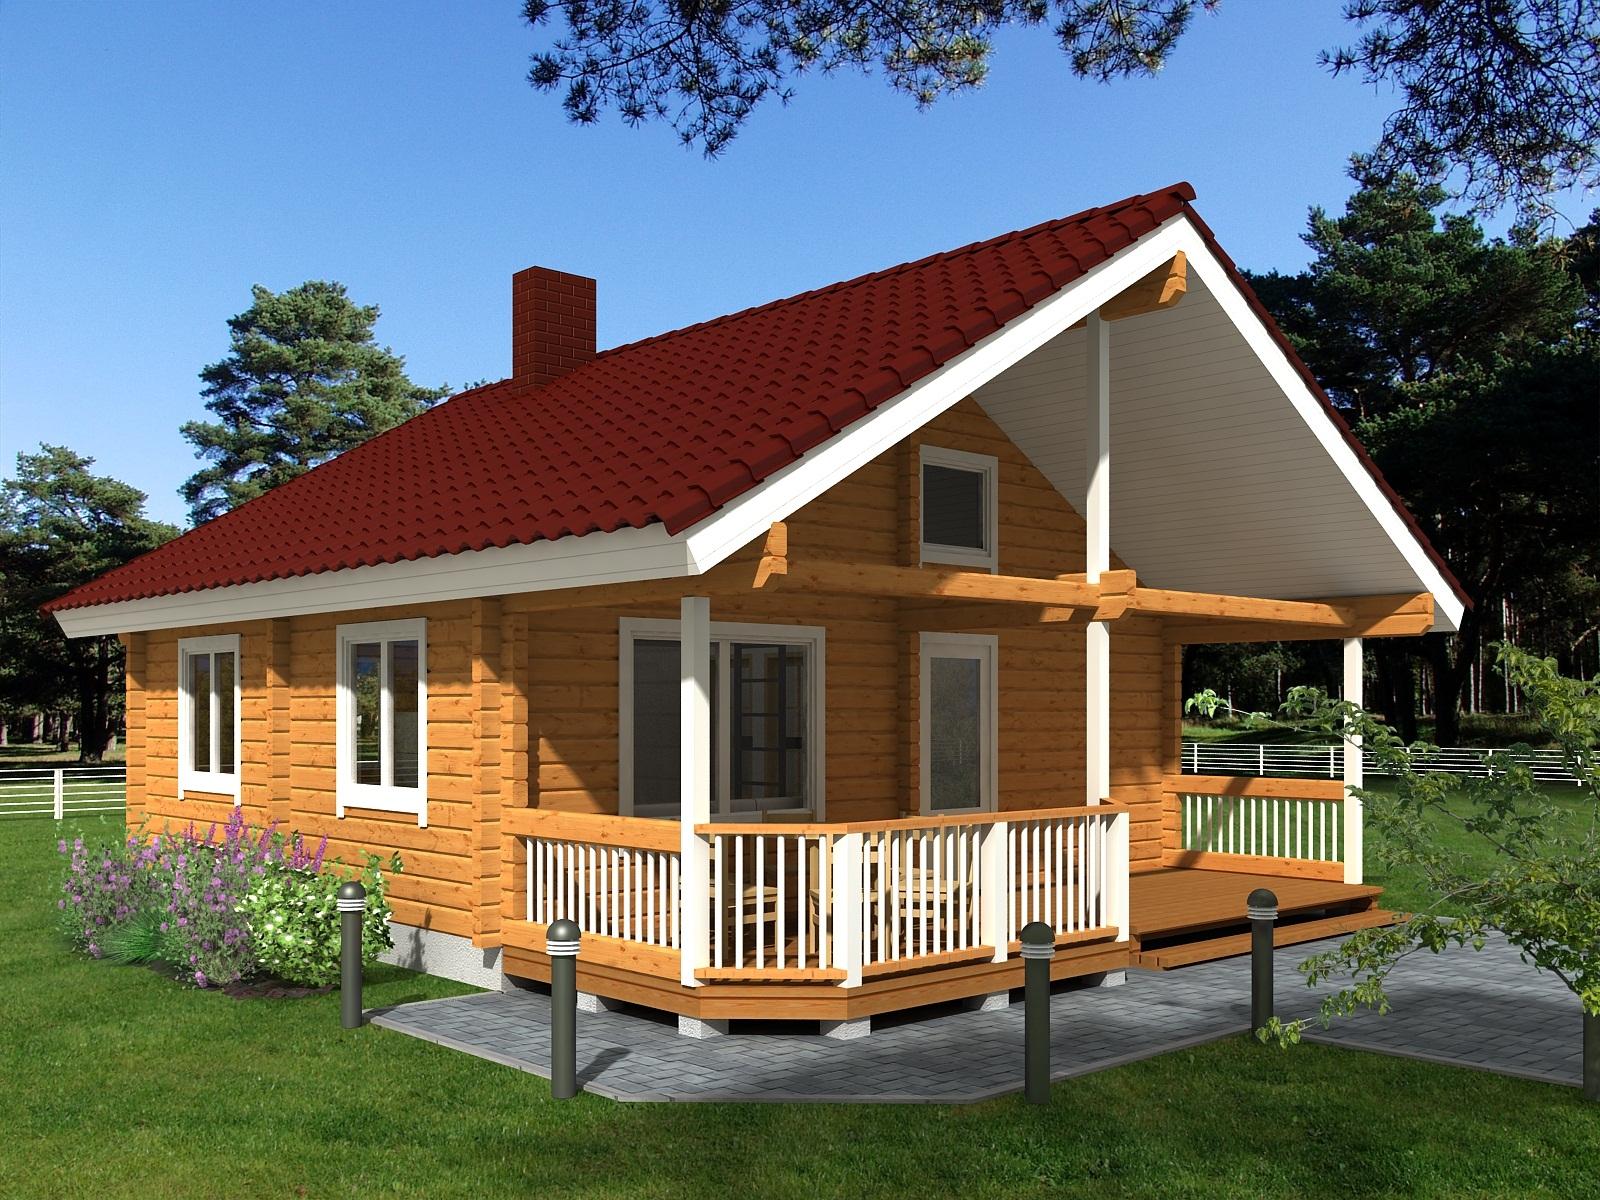 komfort wohnbau gmbh blockhaus massivhausbau blockhausbau. Black Bedroom Furniture Sets. Home Design Ideas